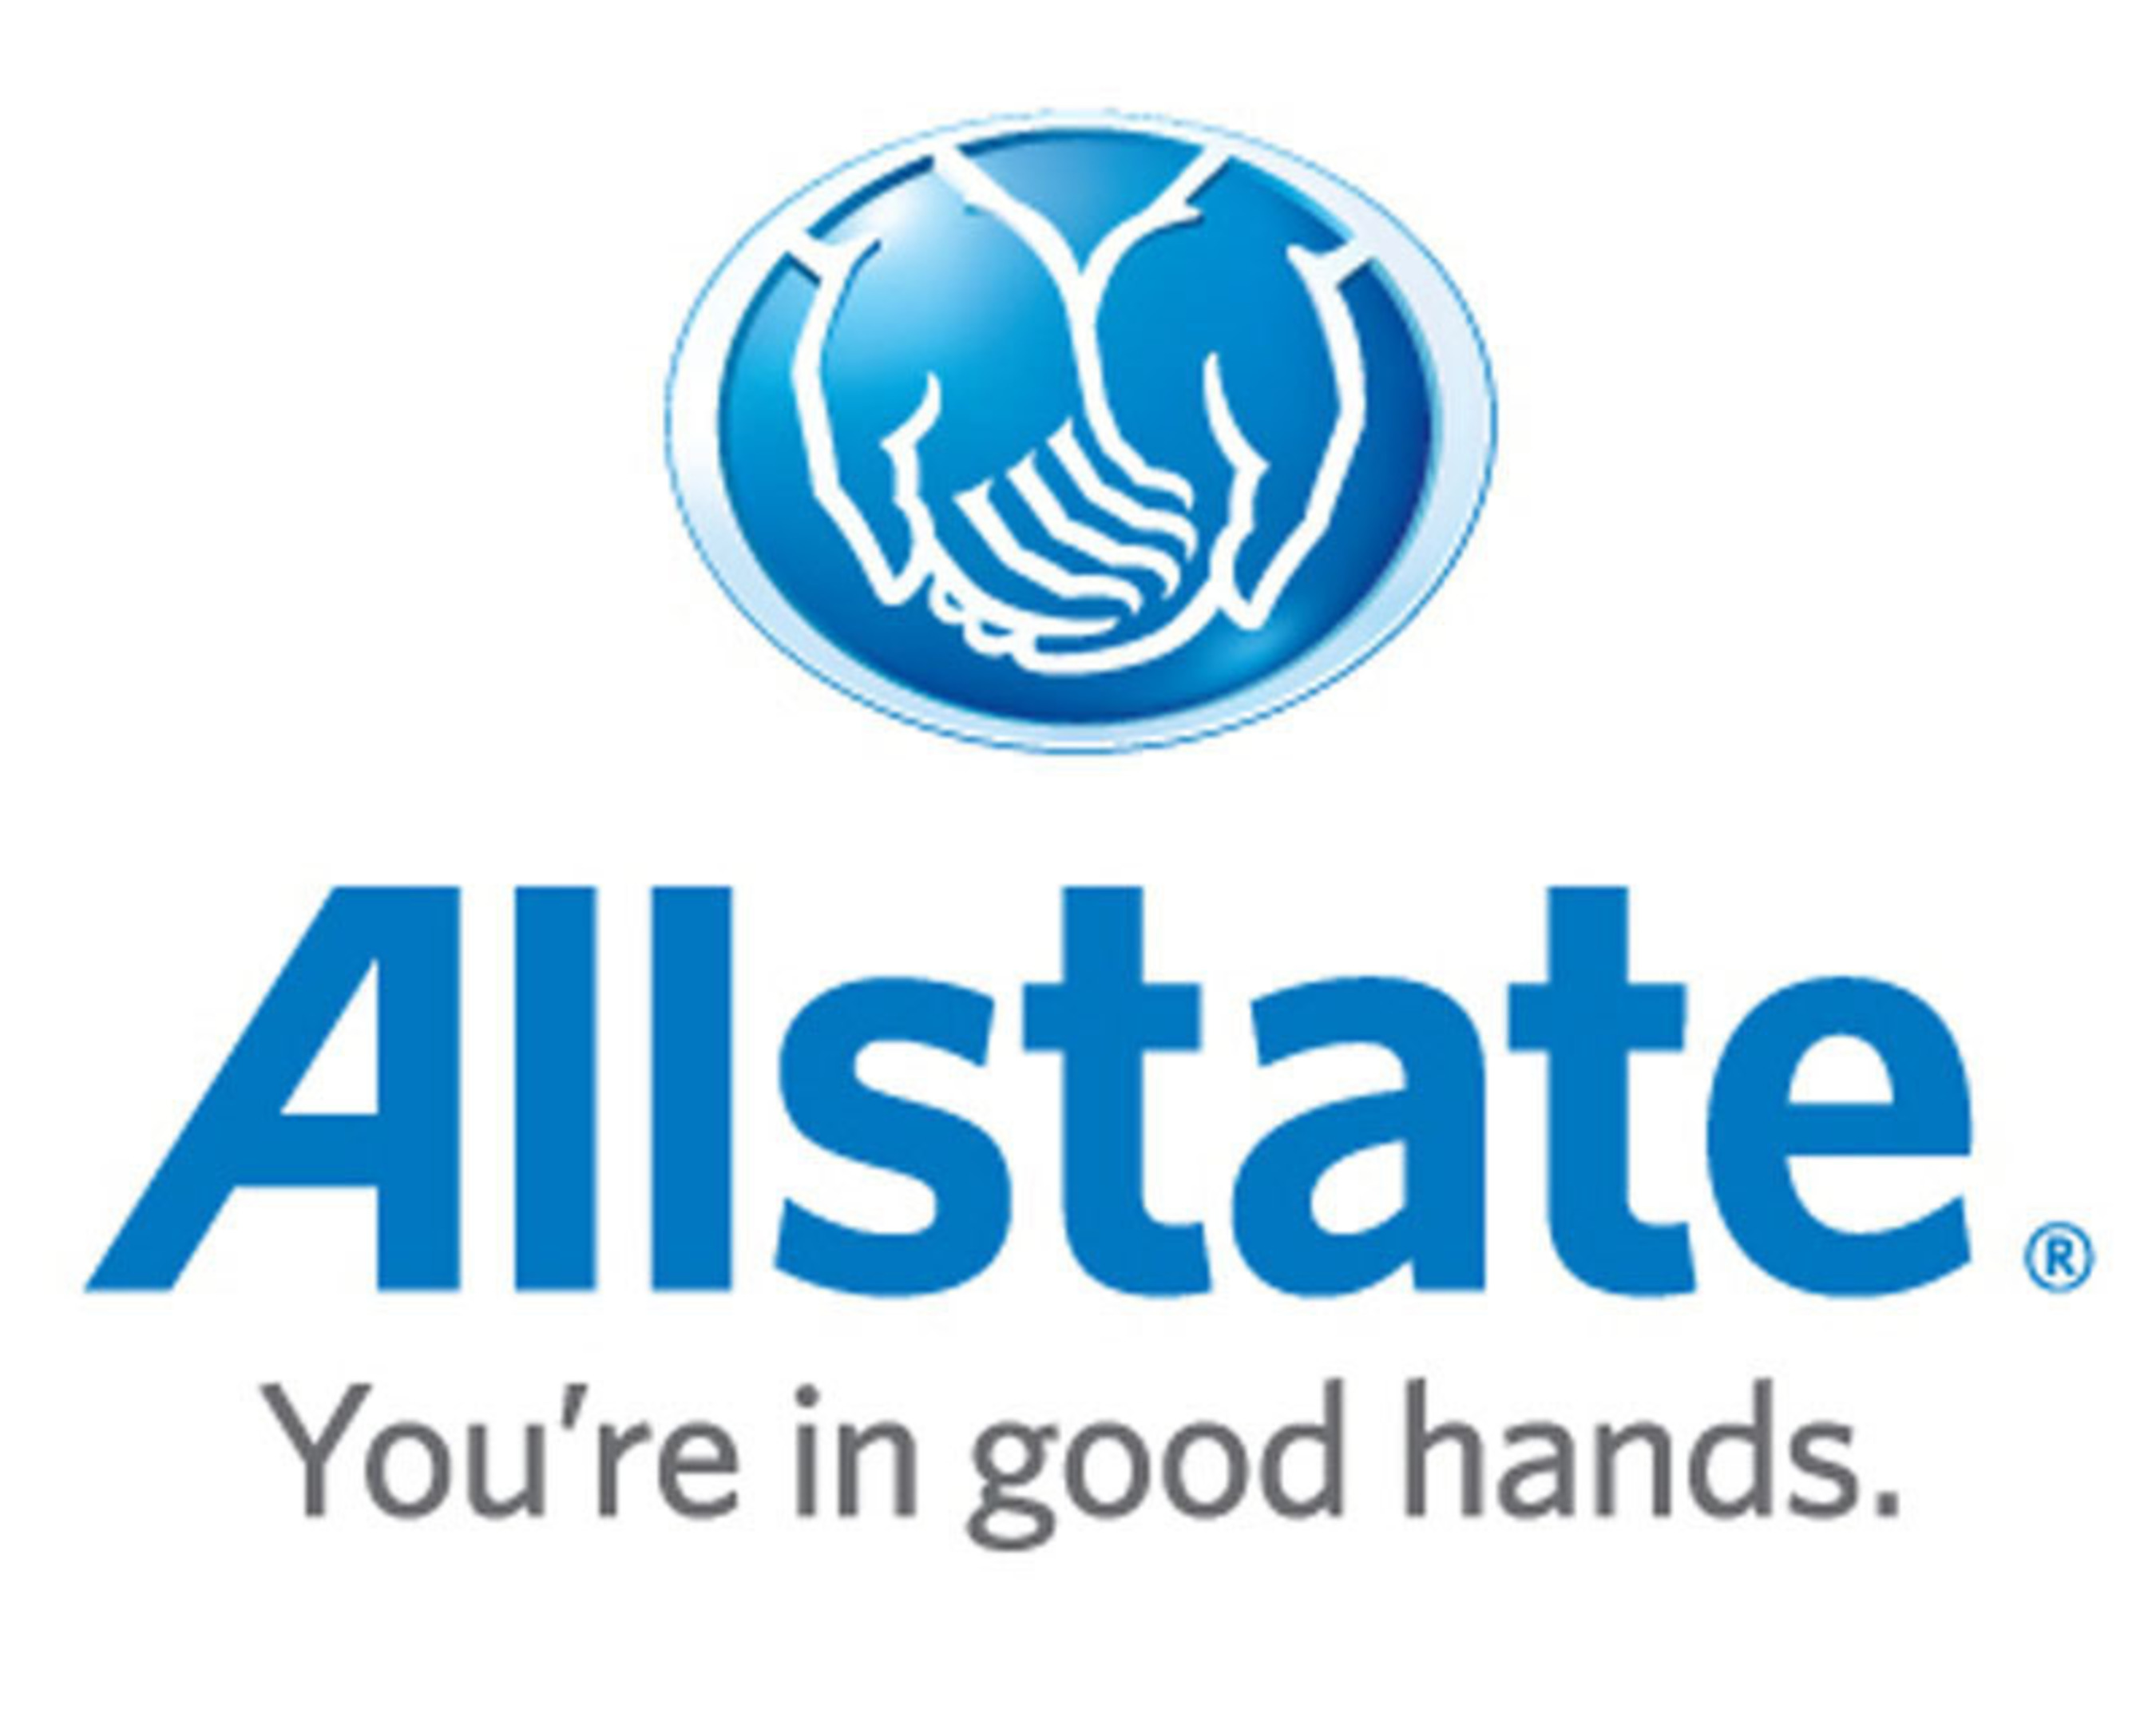 Allstate logo. (PRNewsFoto/Allstate Insurance Company) (PRNewsFoto/) (PRNewsFoto/)